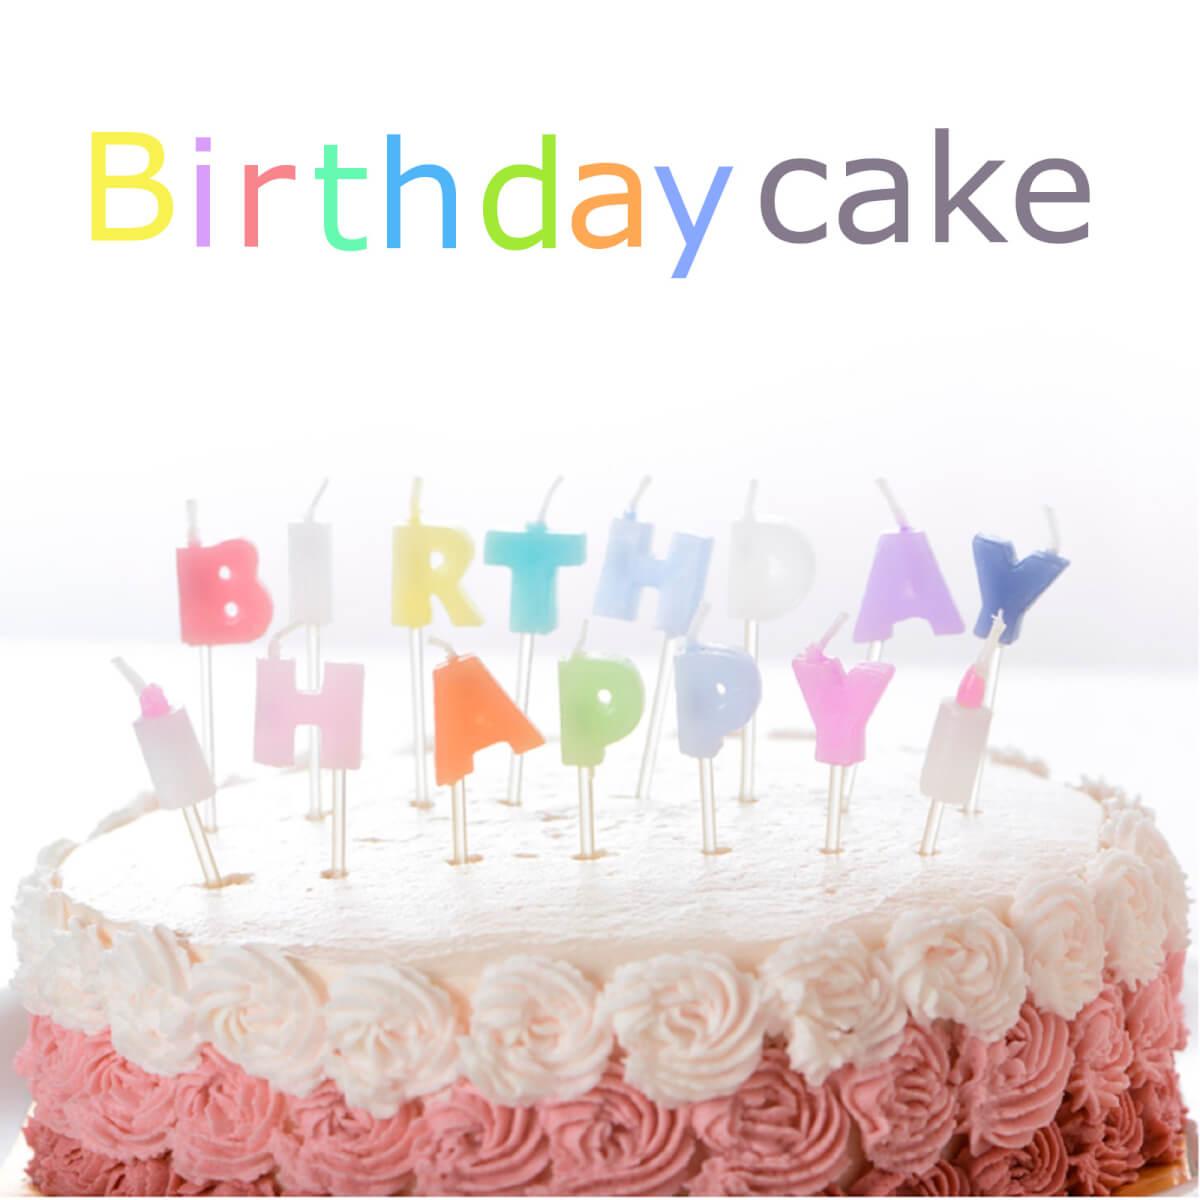 sou.universeのオリジナル曲のBirthday cake